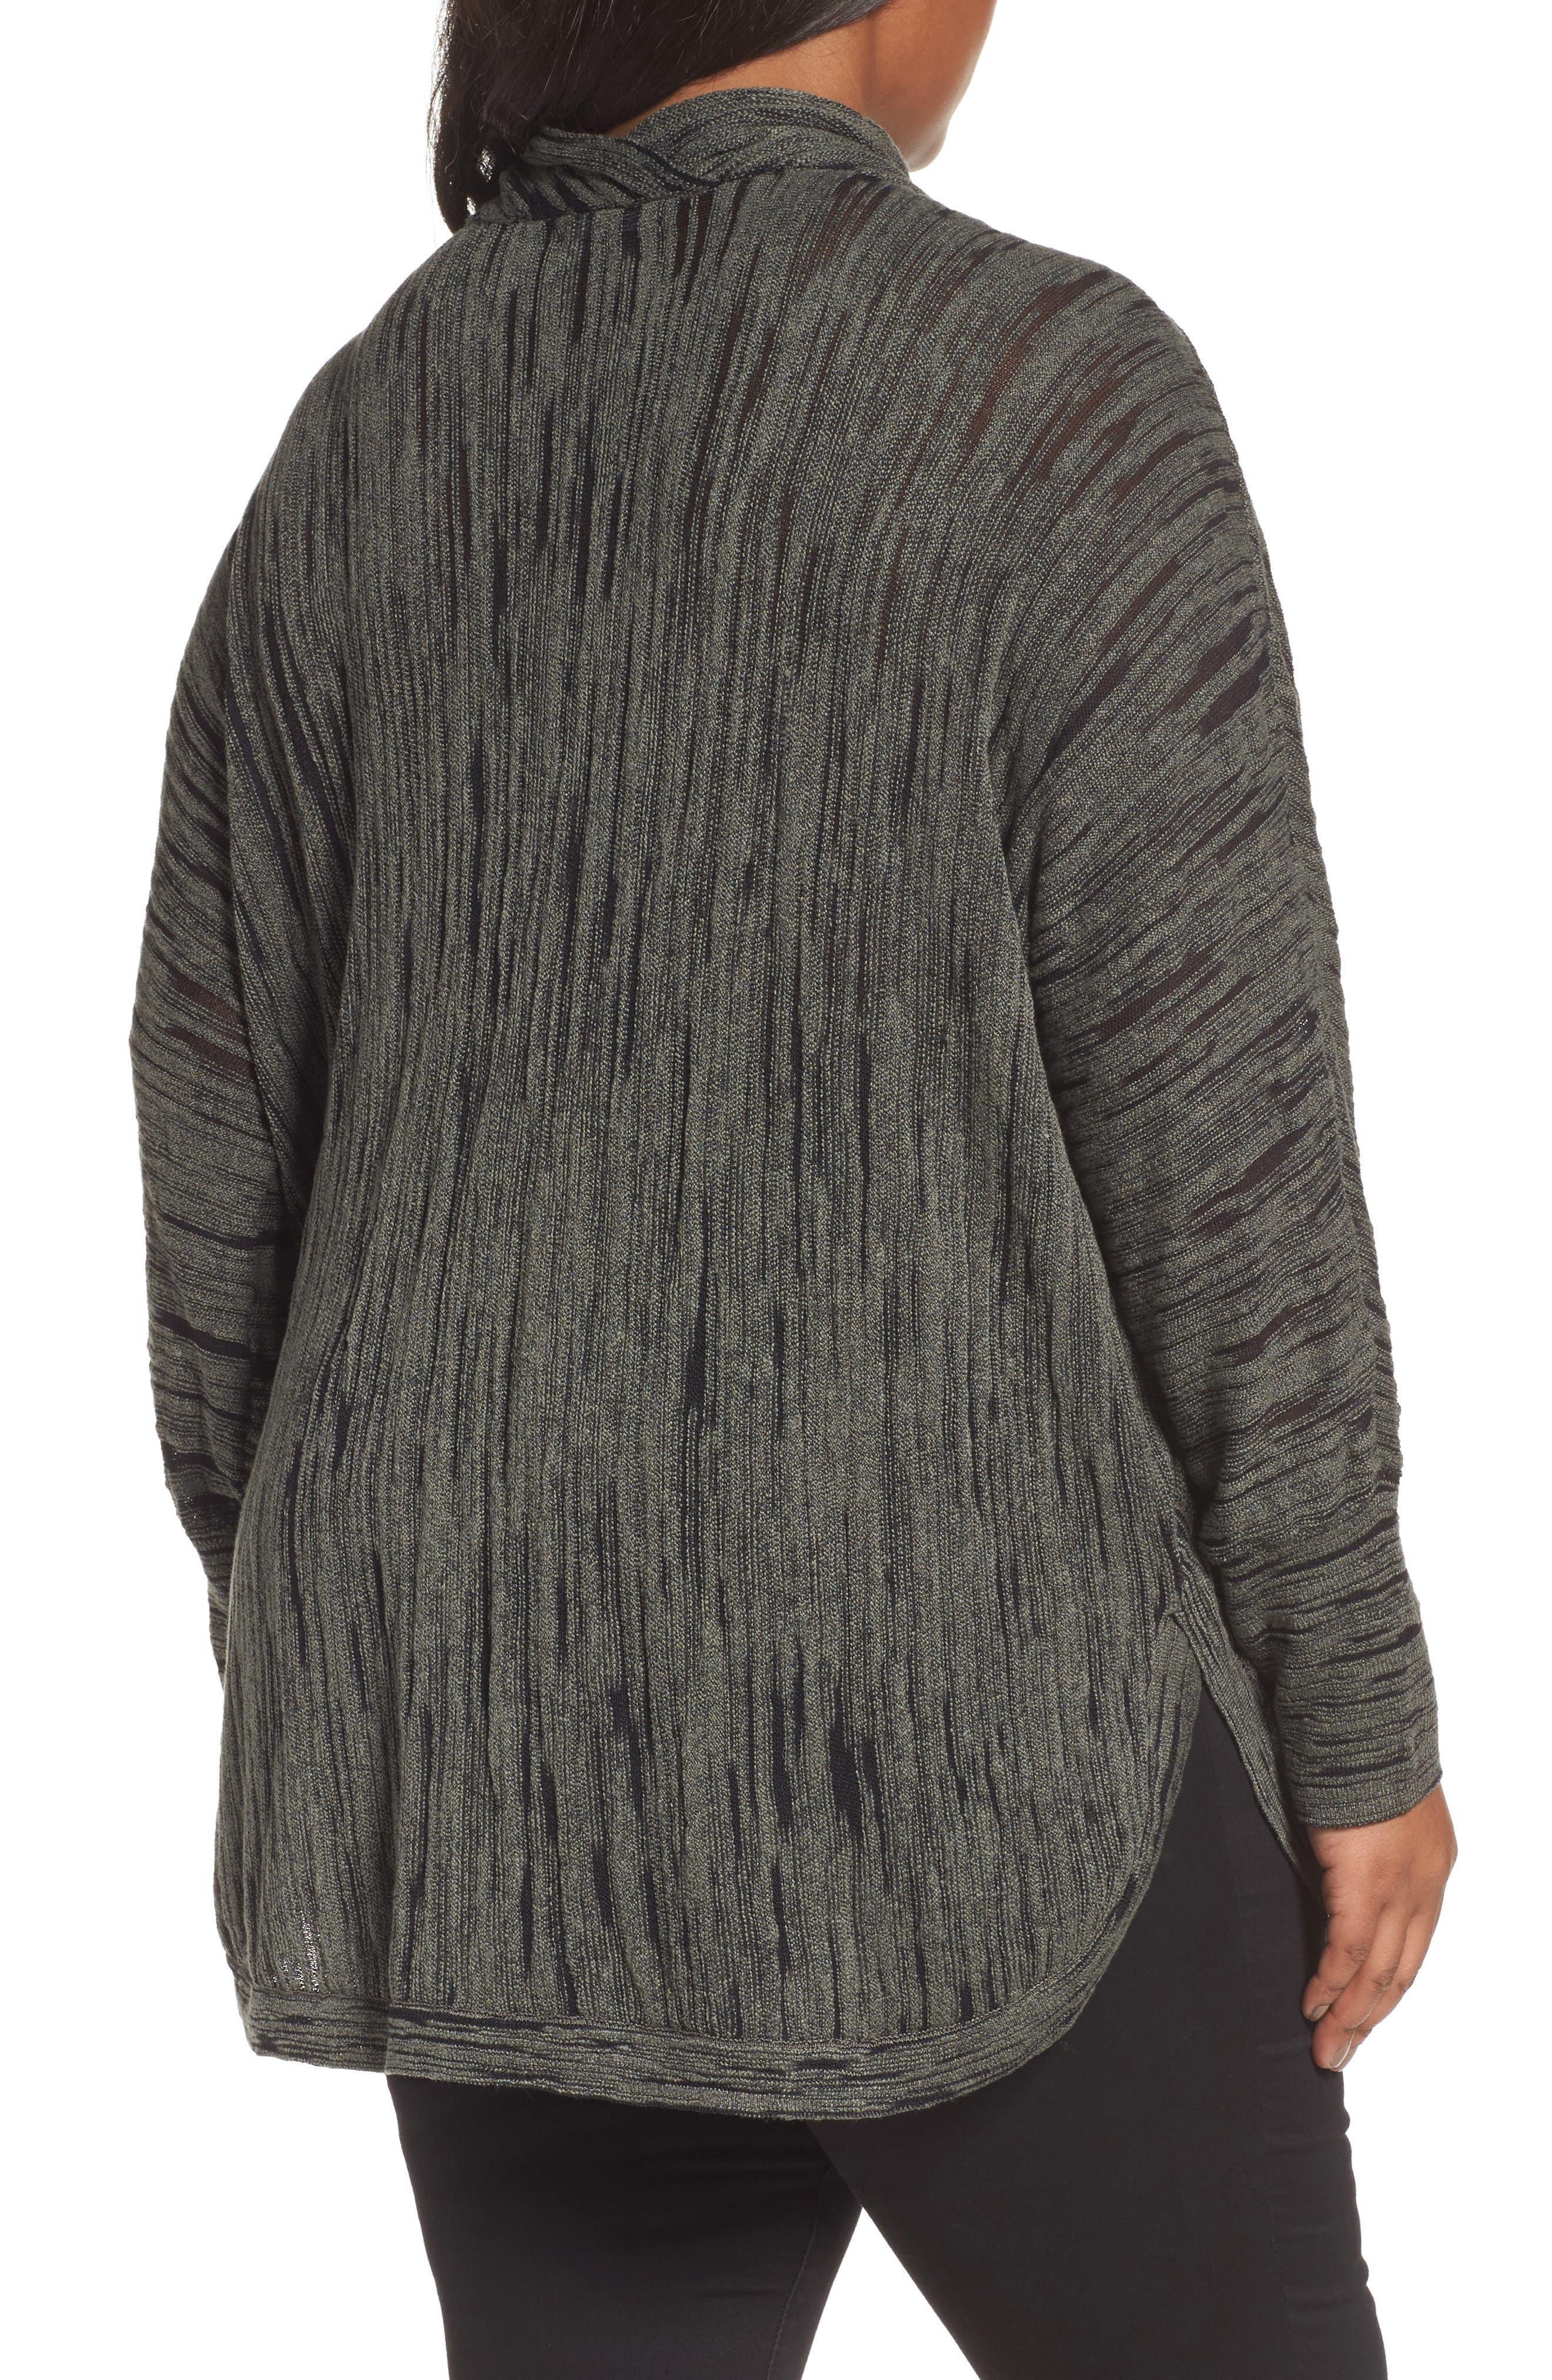 Alternate Image 2  - NIC+ZOE Cowl Neck Top (Plus Size)